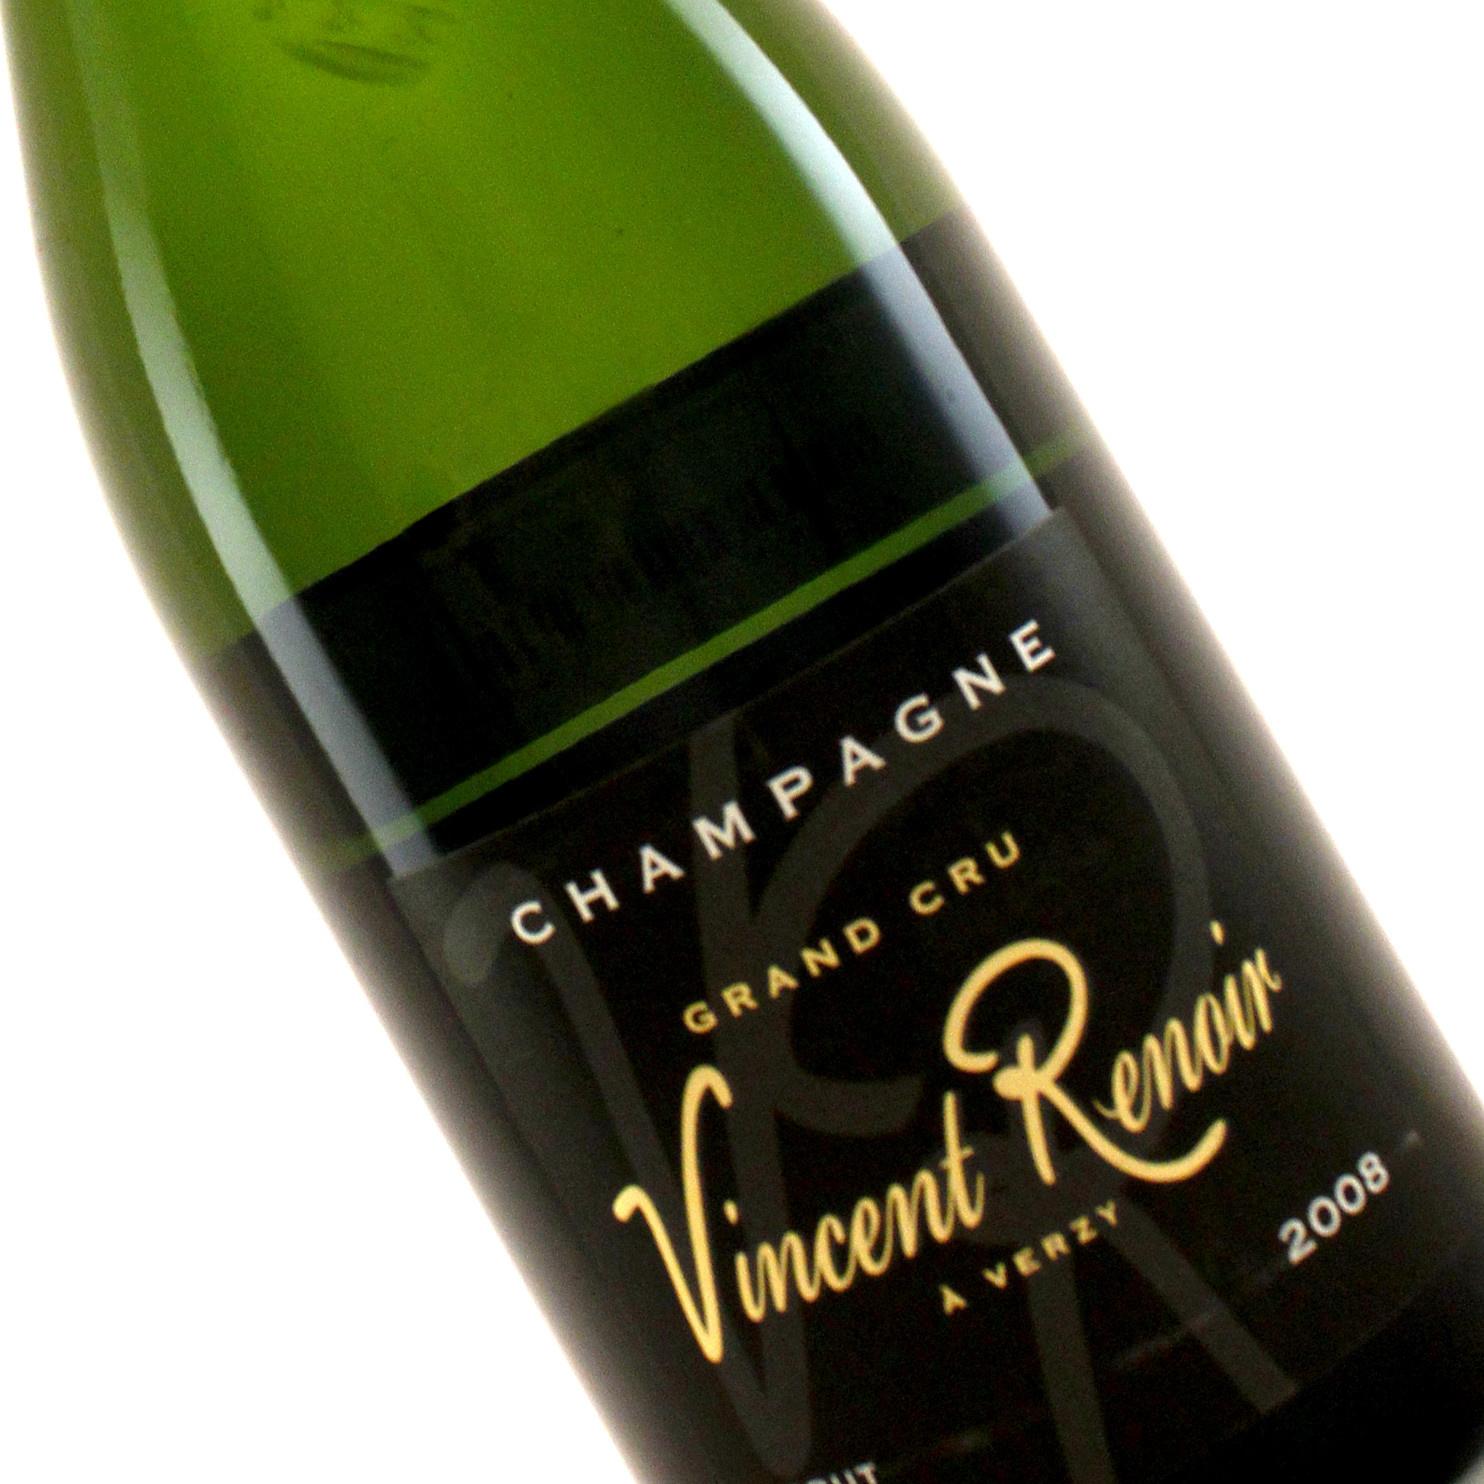 Vincent Renoir 2008 Champagne Grand Cru Brut